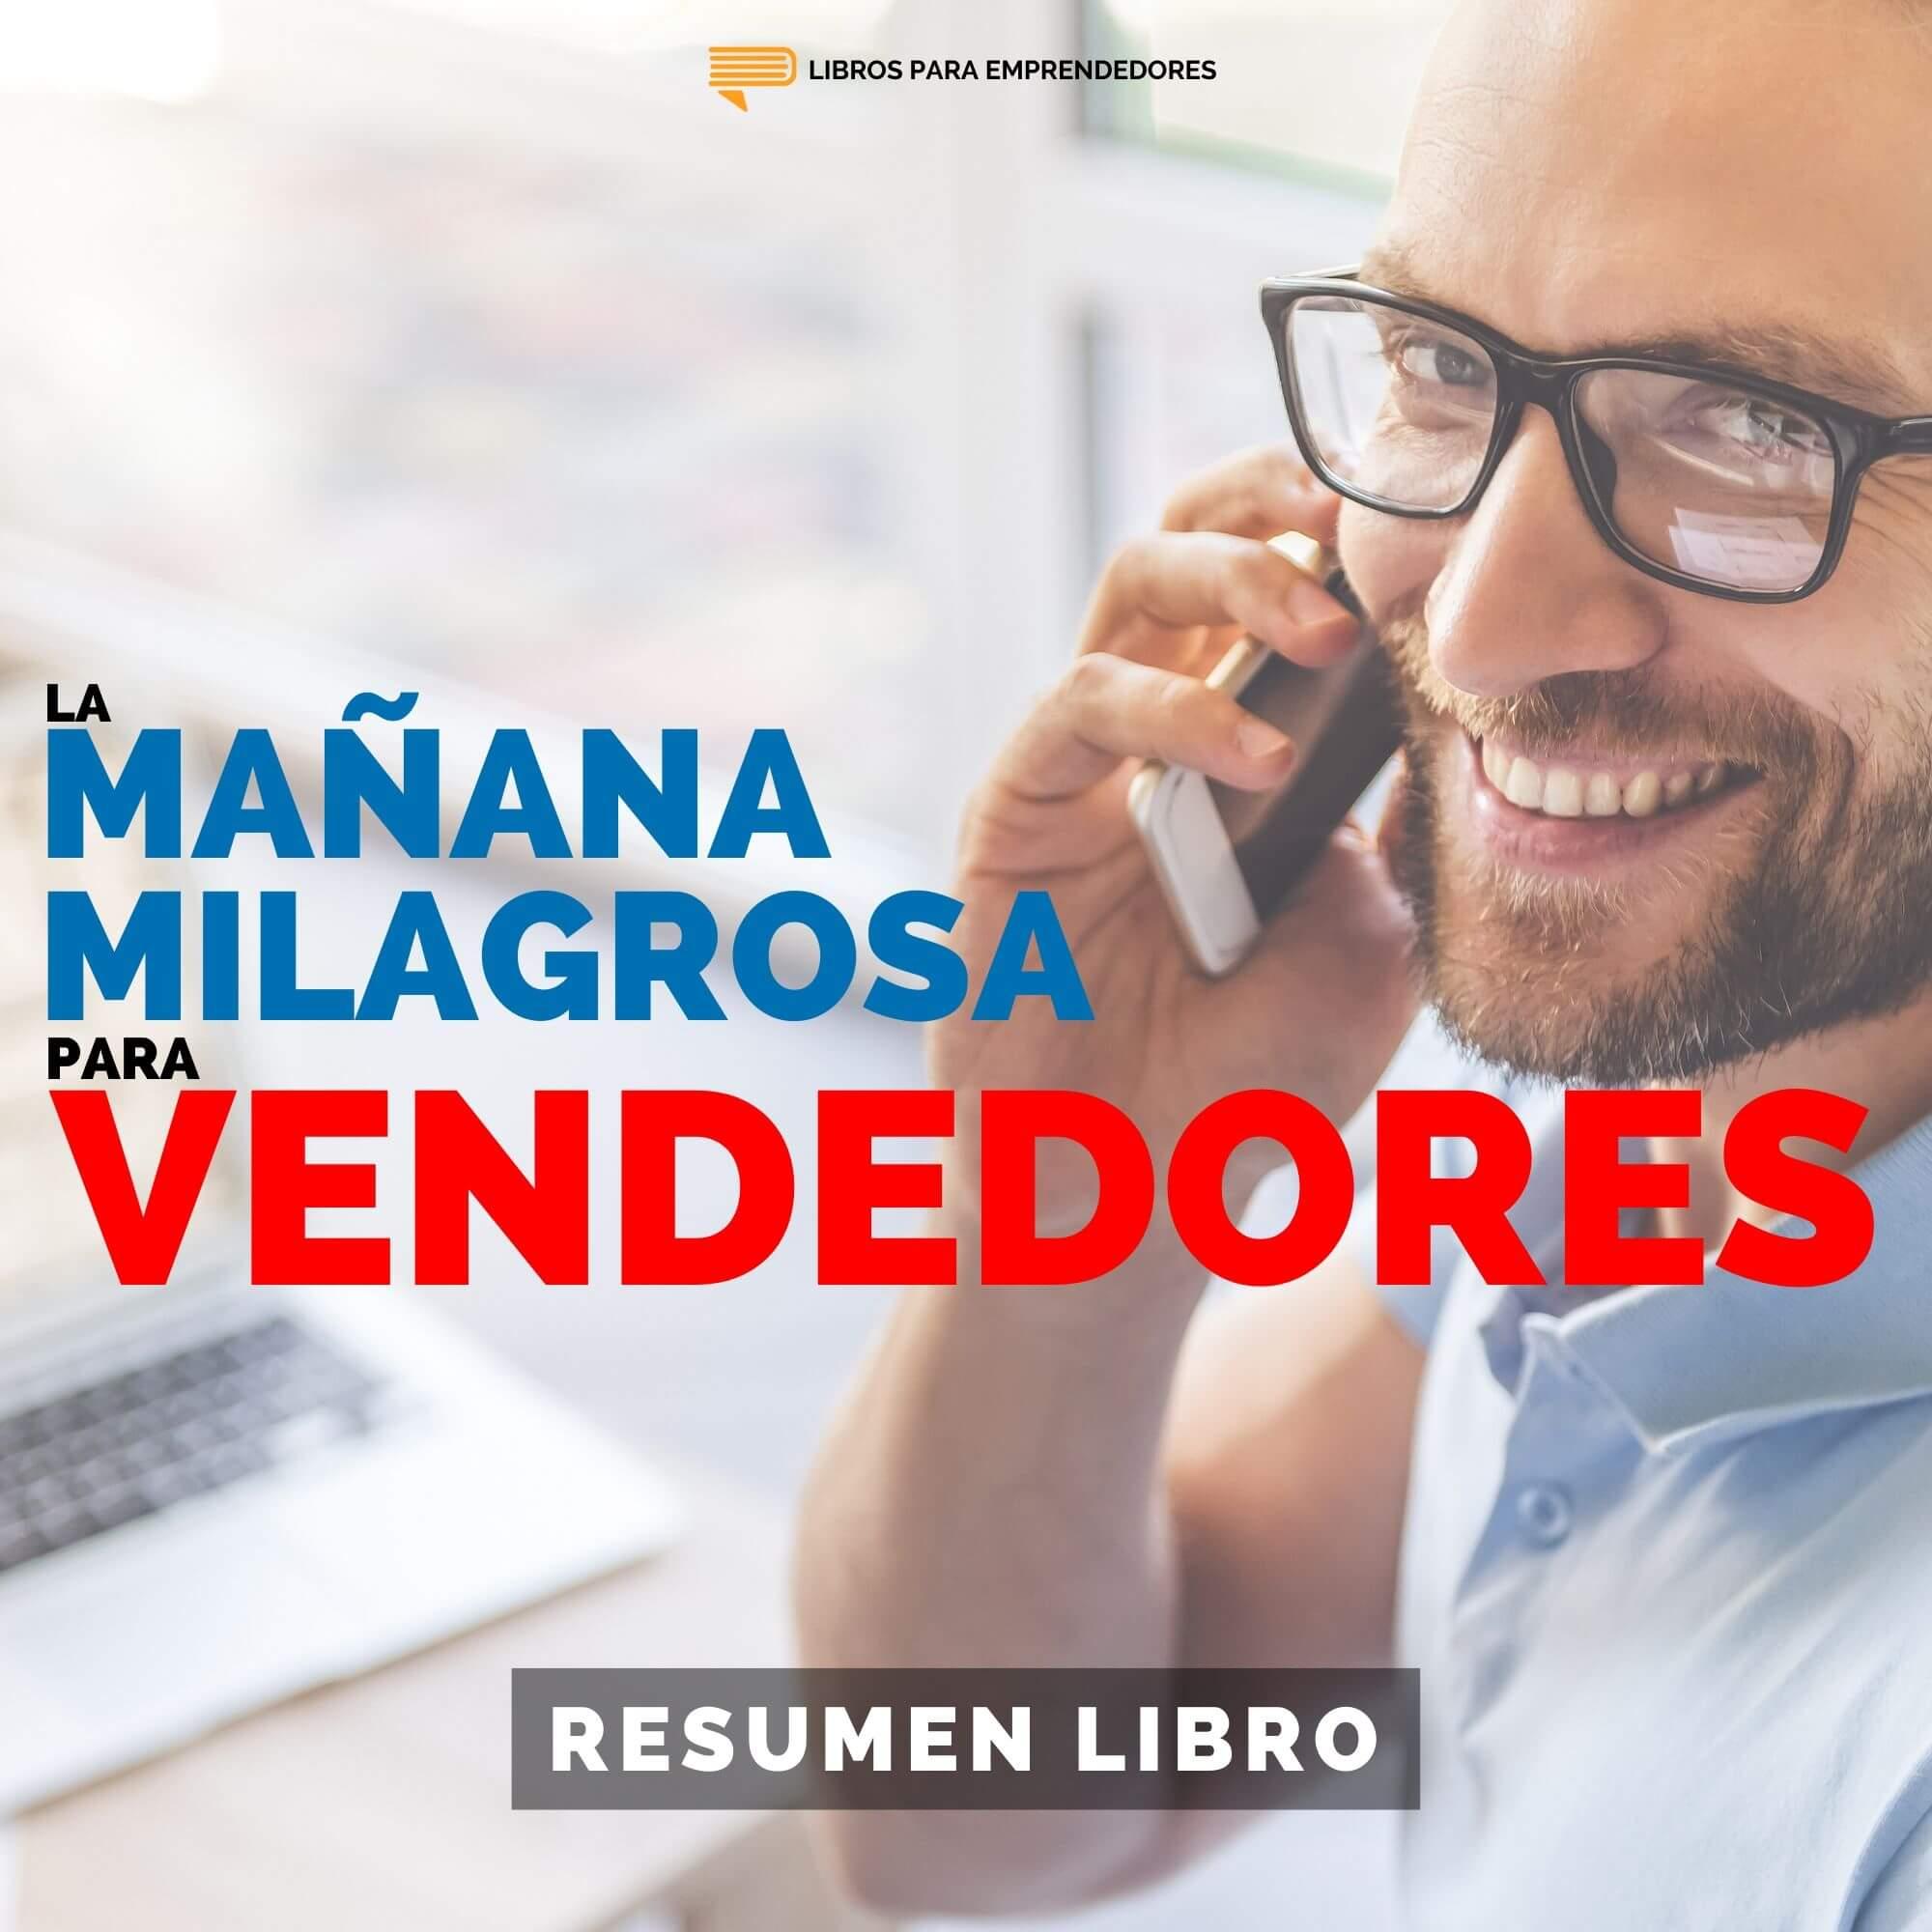 La Mañana Milagrosa para Vendedores - #130 - Un Resumen de Libros para Emprendedores